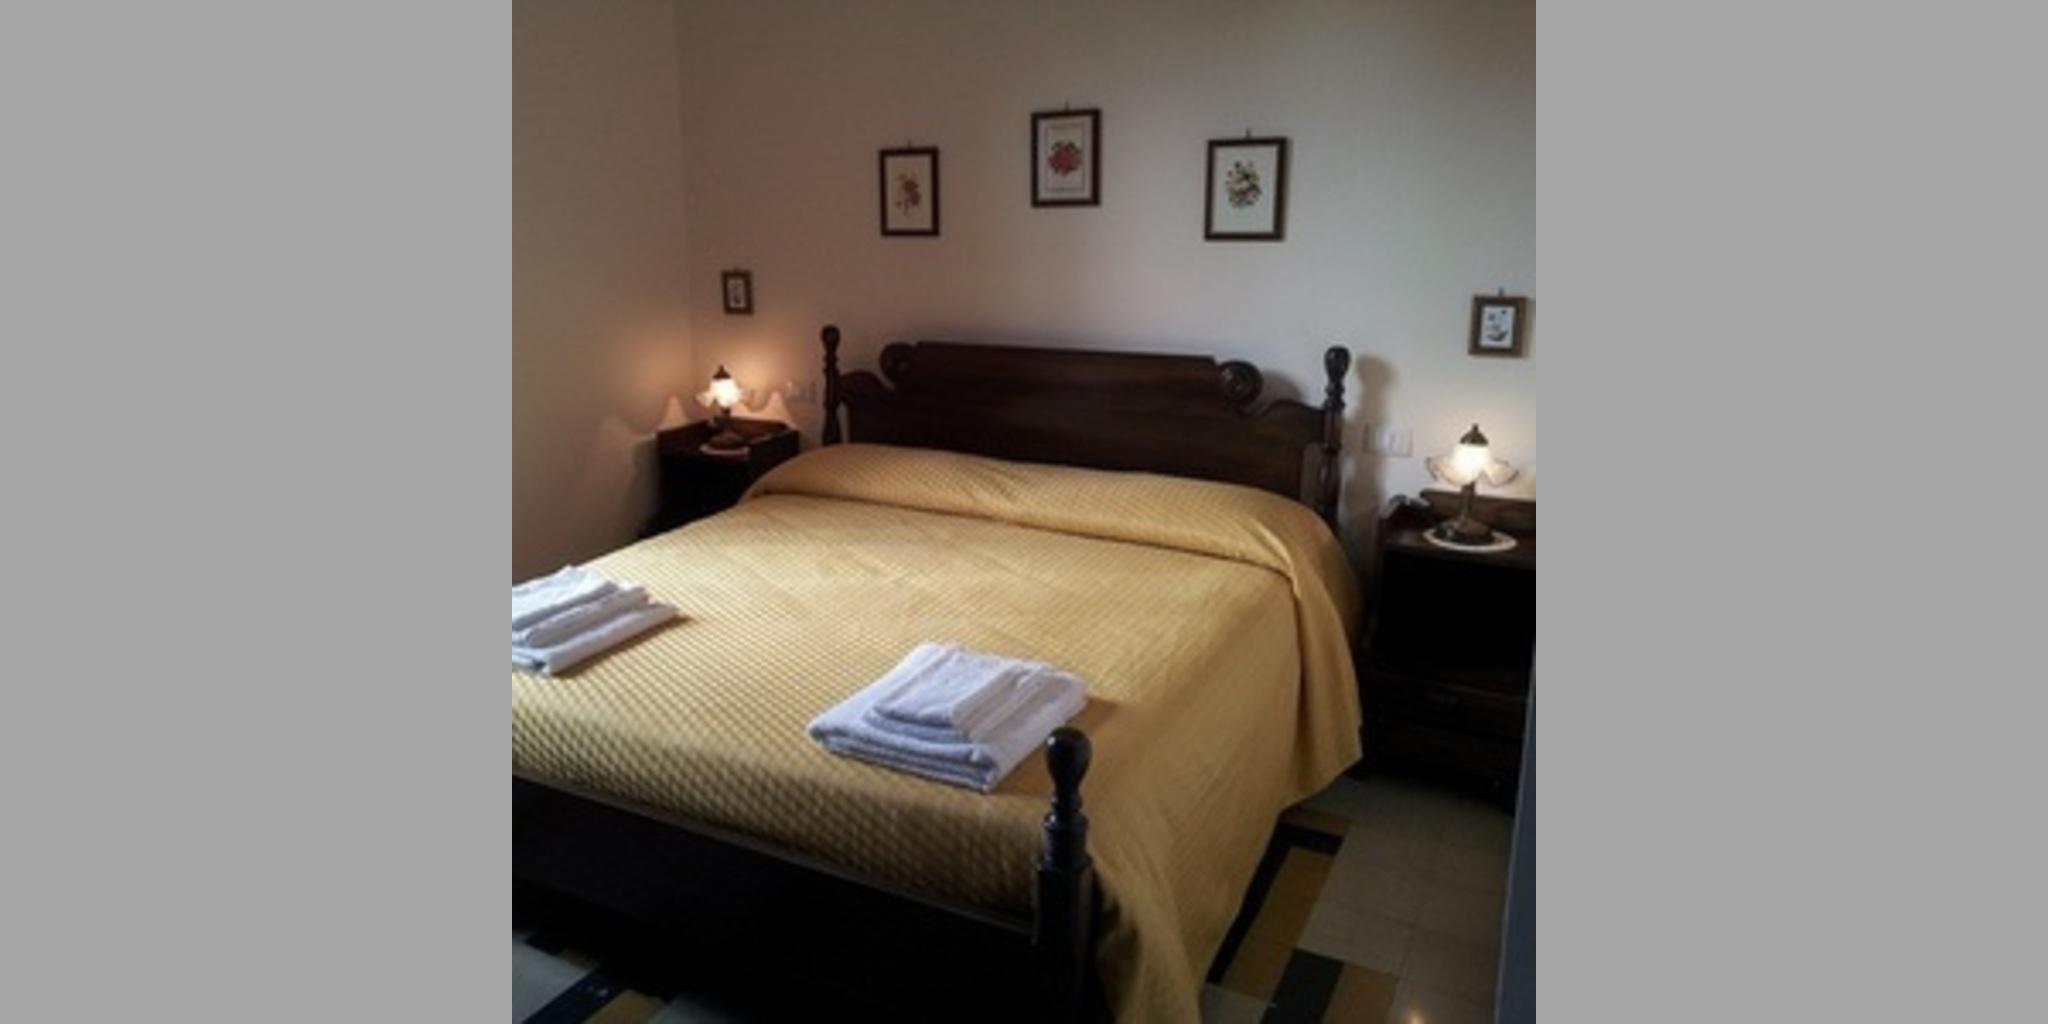 Bed & Breakfast Roma - San Giovanni Appia Nuova